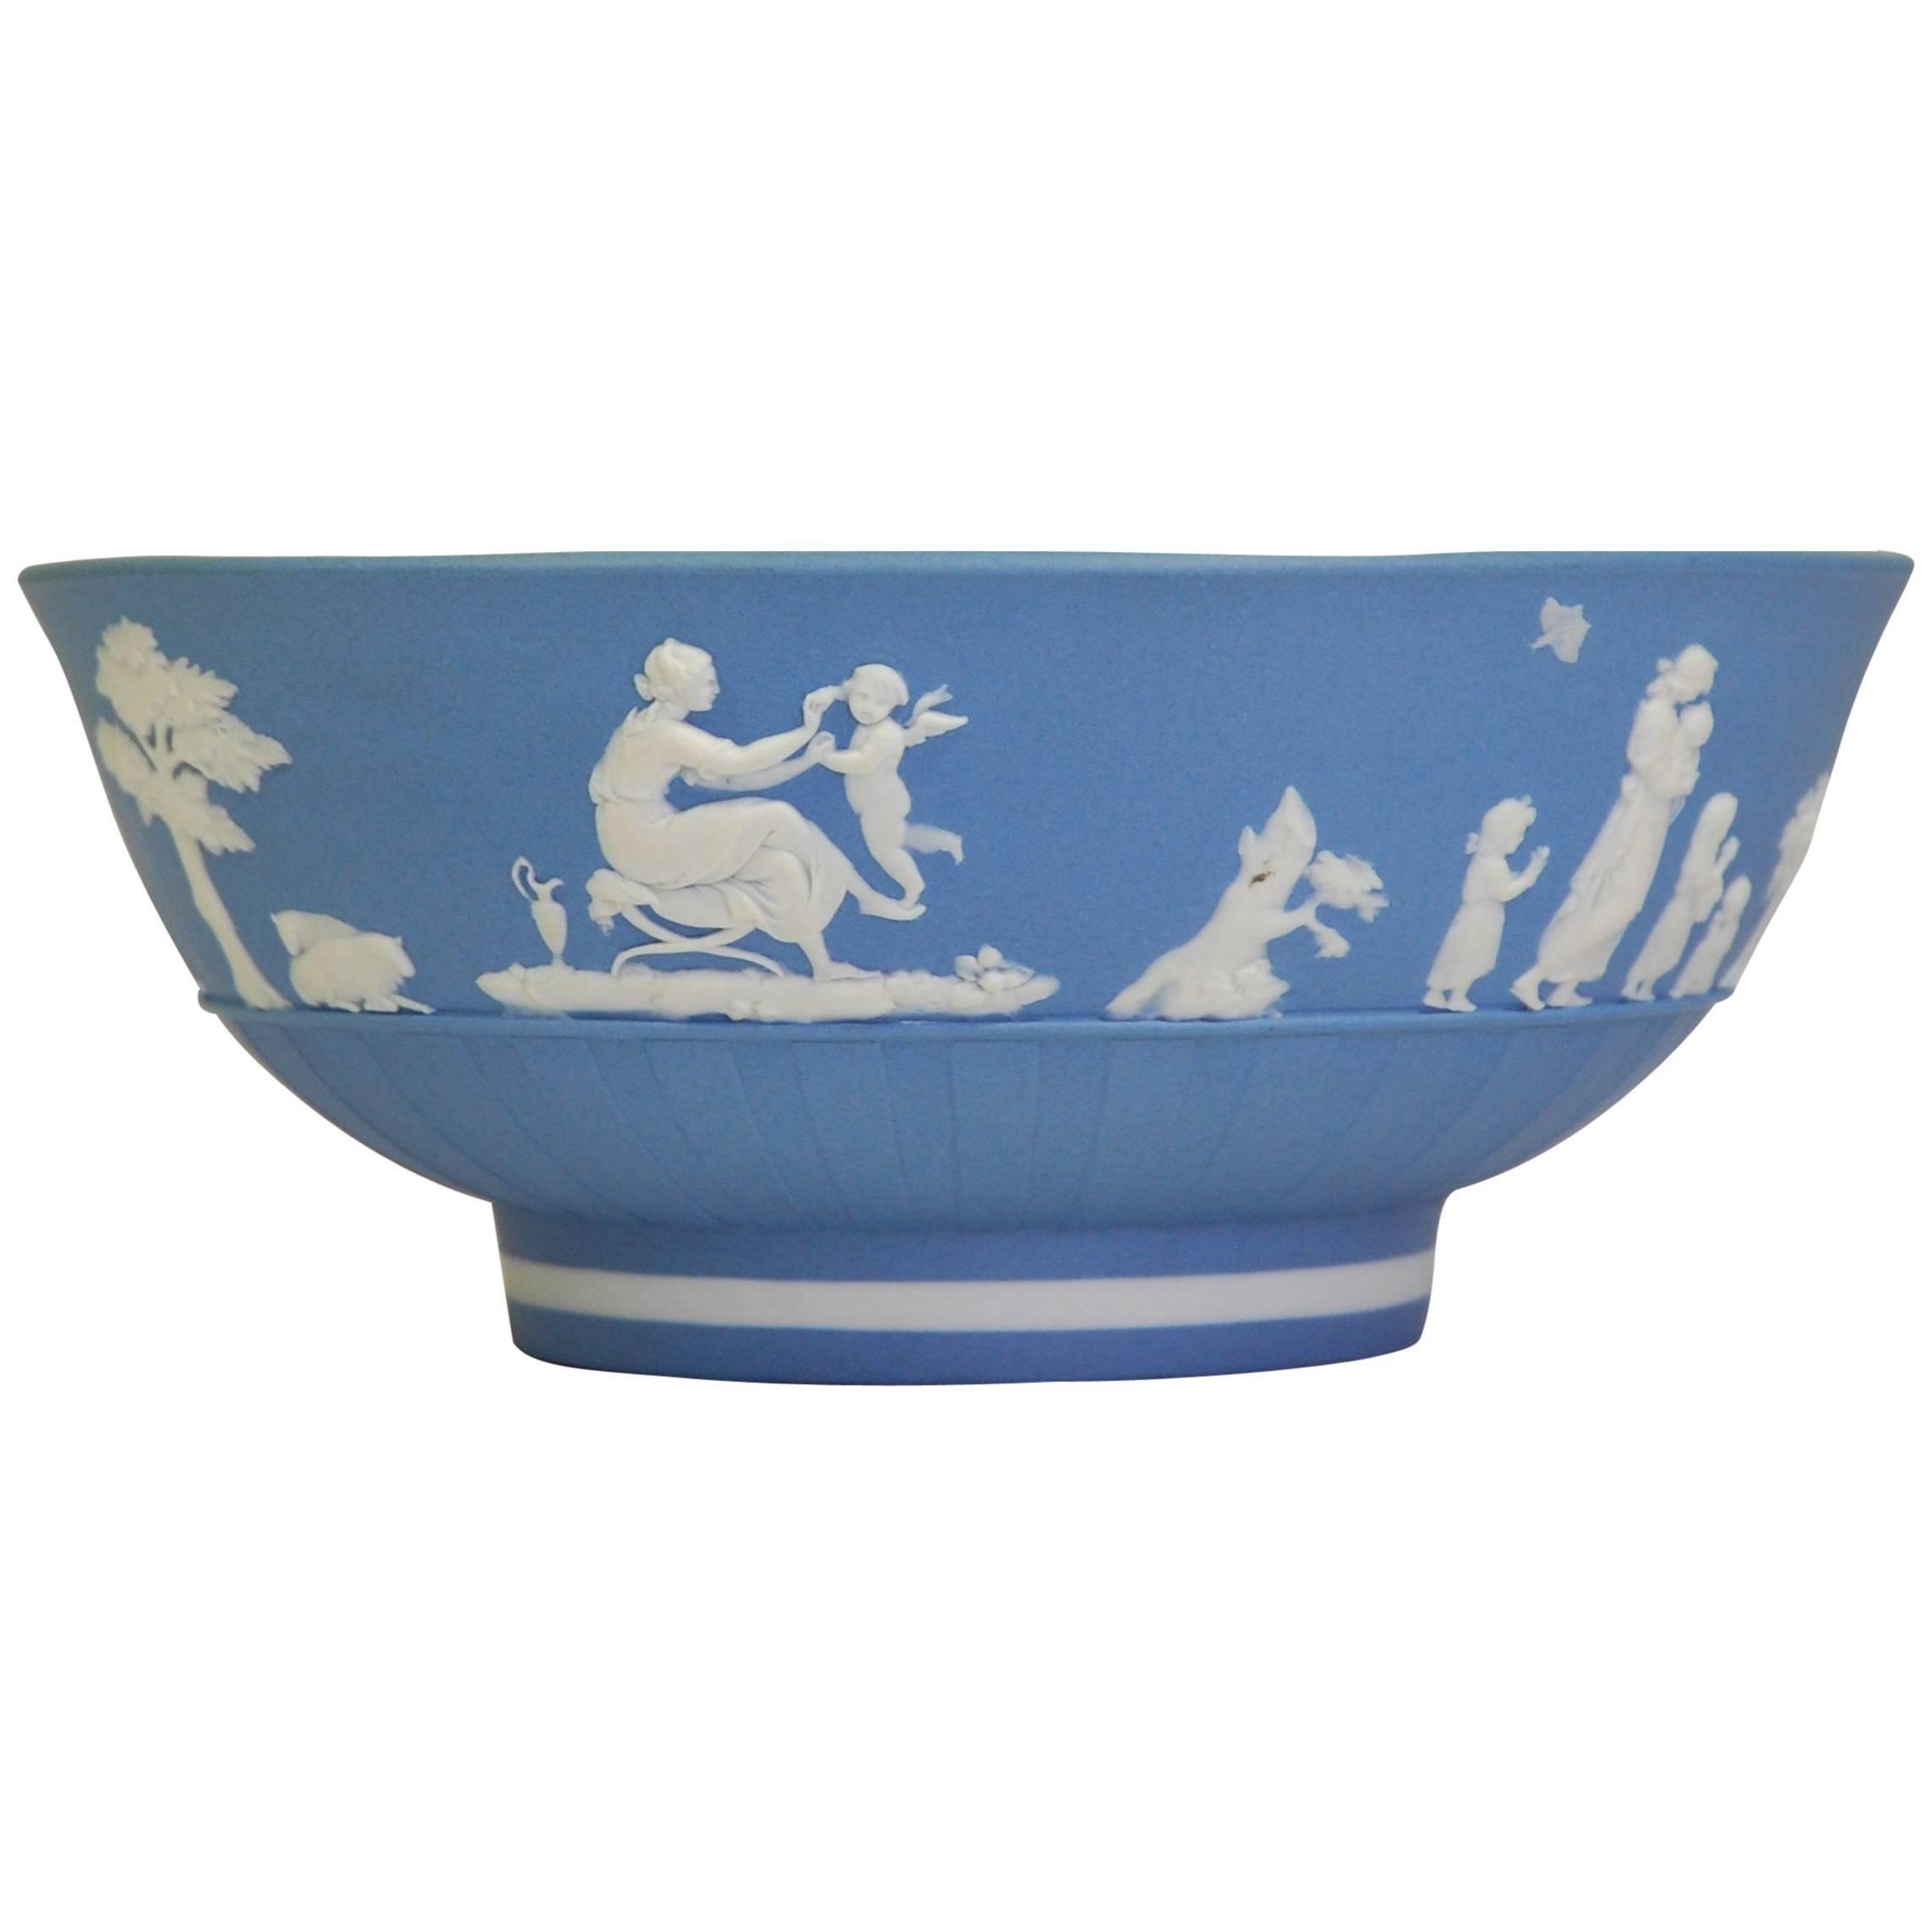 Pale Blue Jasperware Bowl, Wedgwood, circa 1790